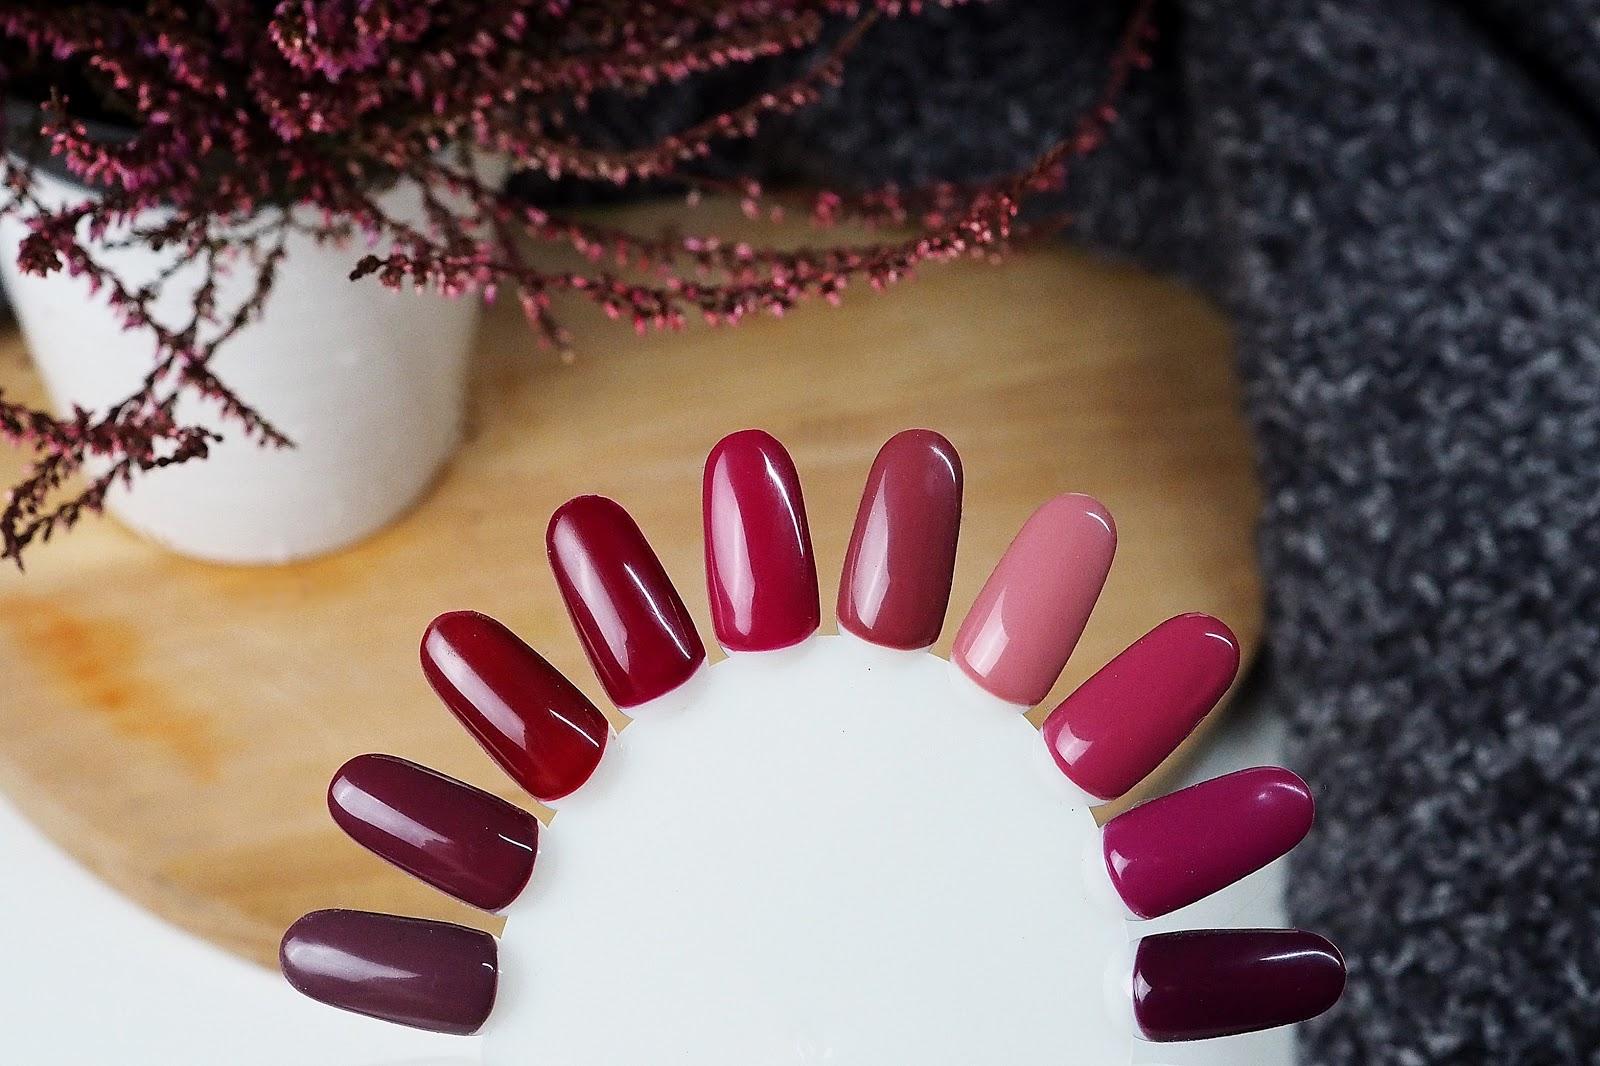 Kolor burgund paznokcie